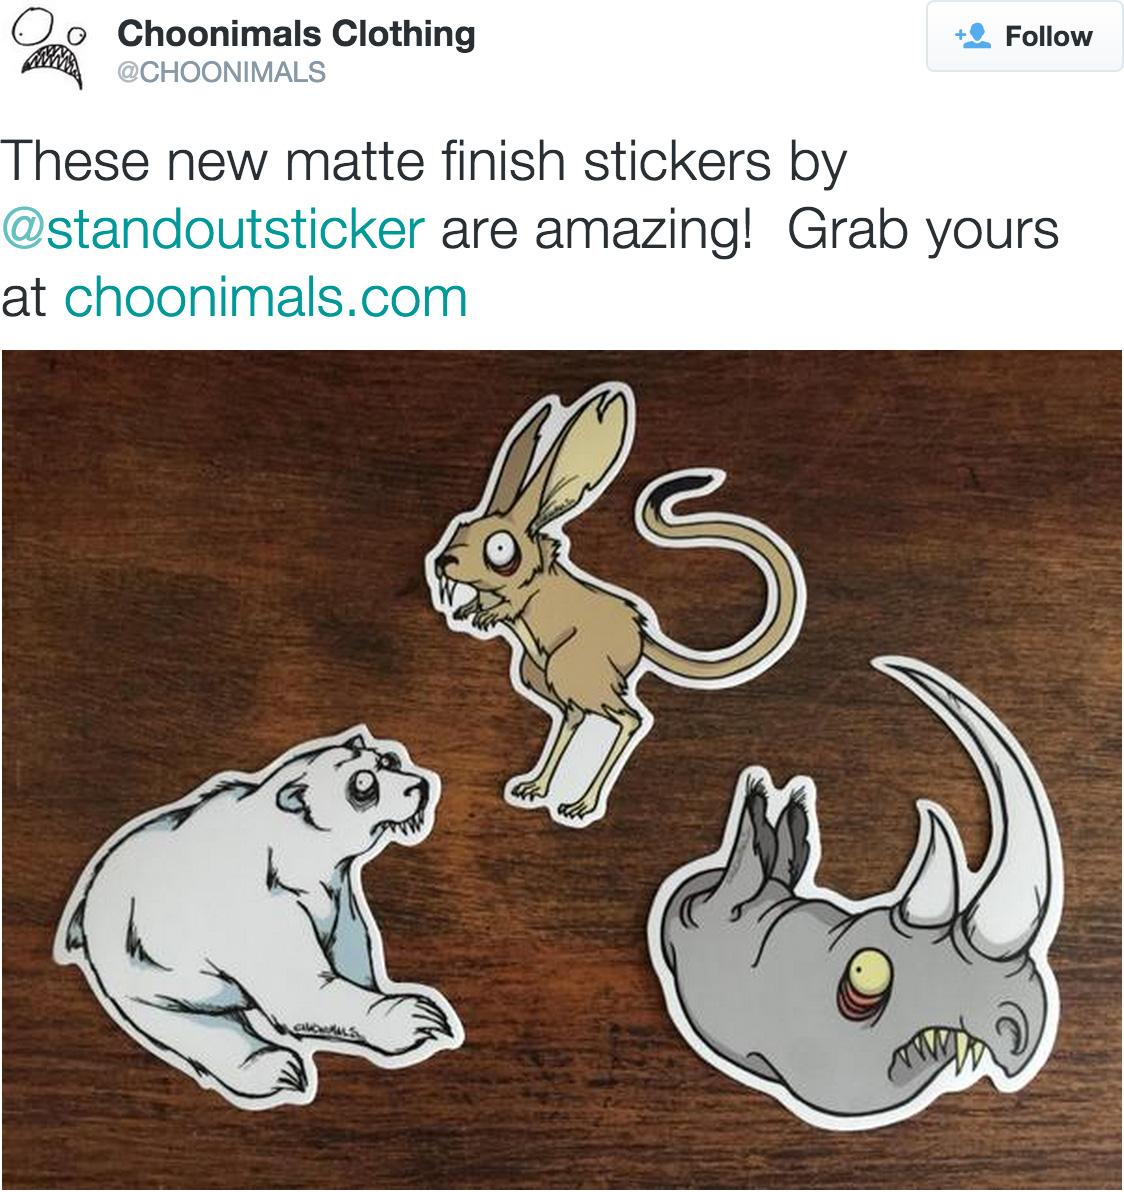 Custom Stickers for Choonimals Clothing